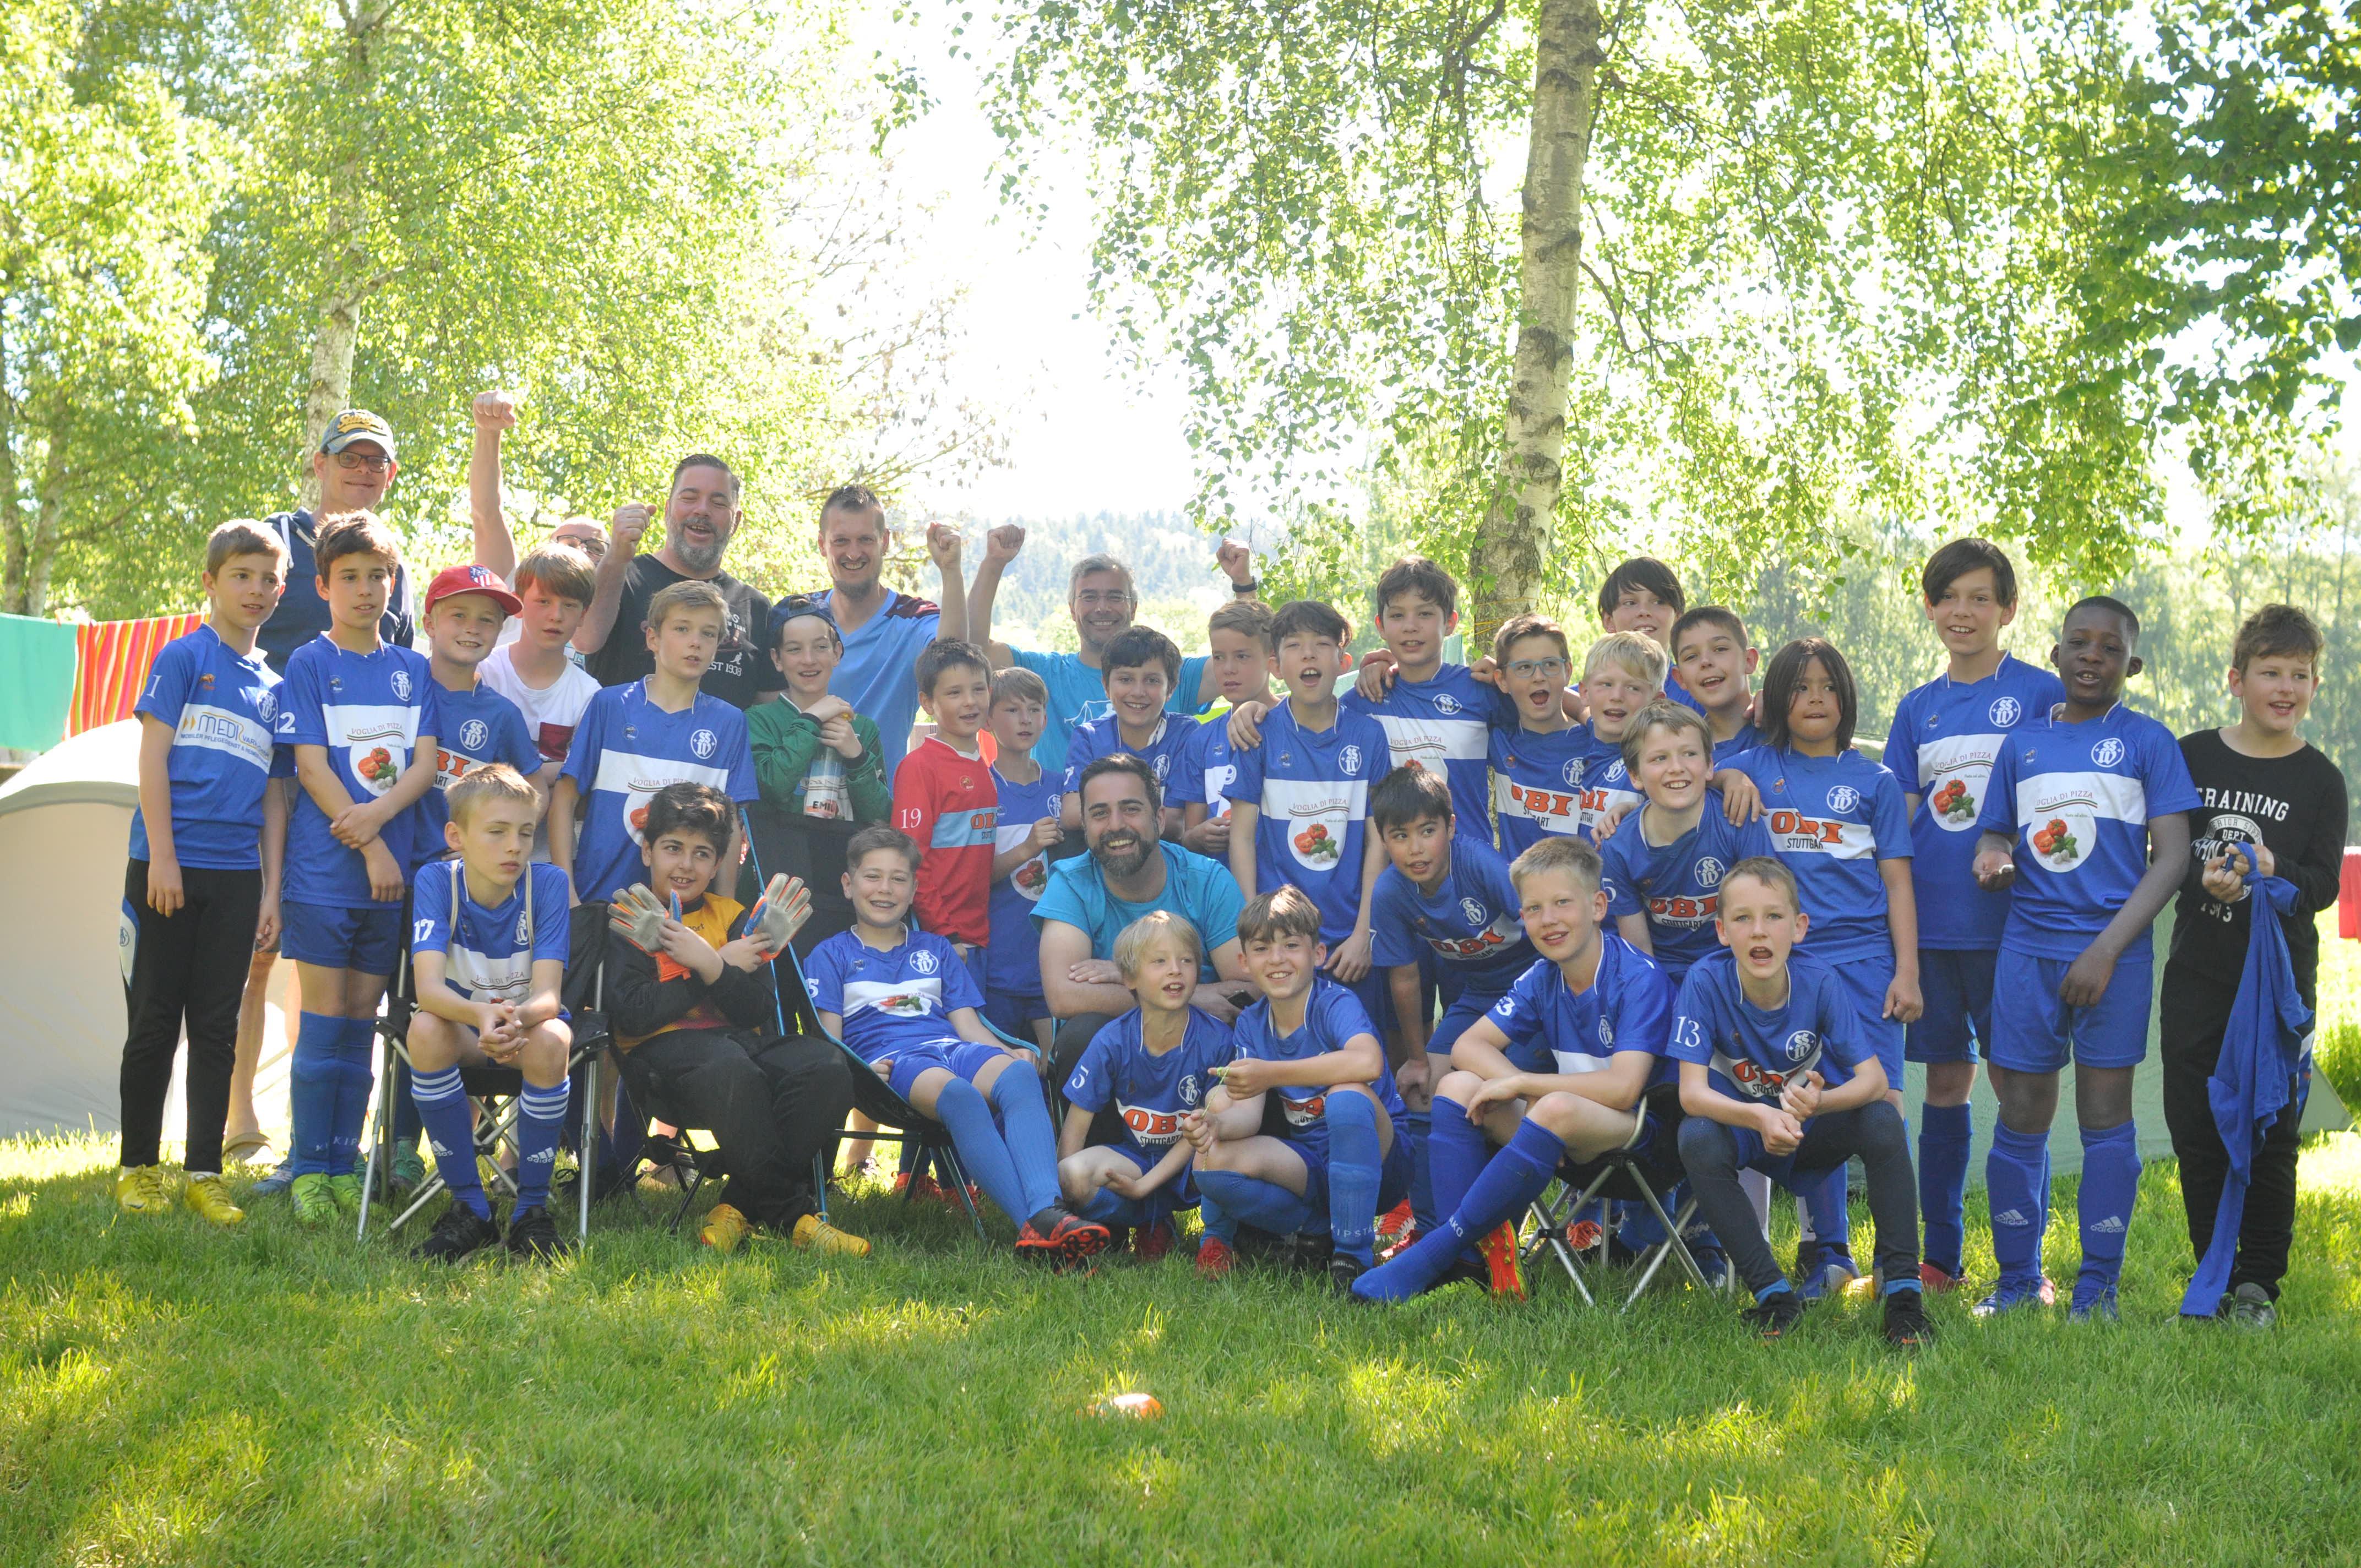 Fußball-Camp am Illmensee 2019